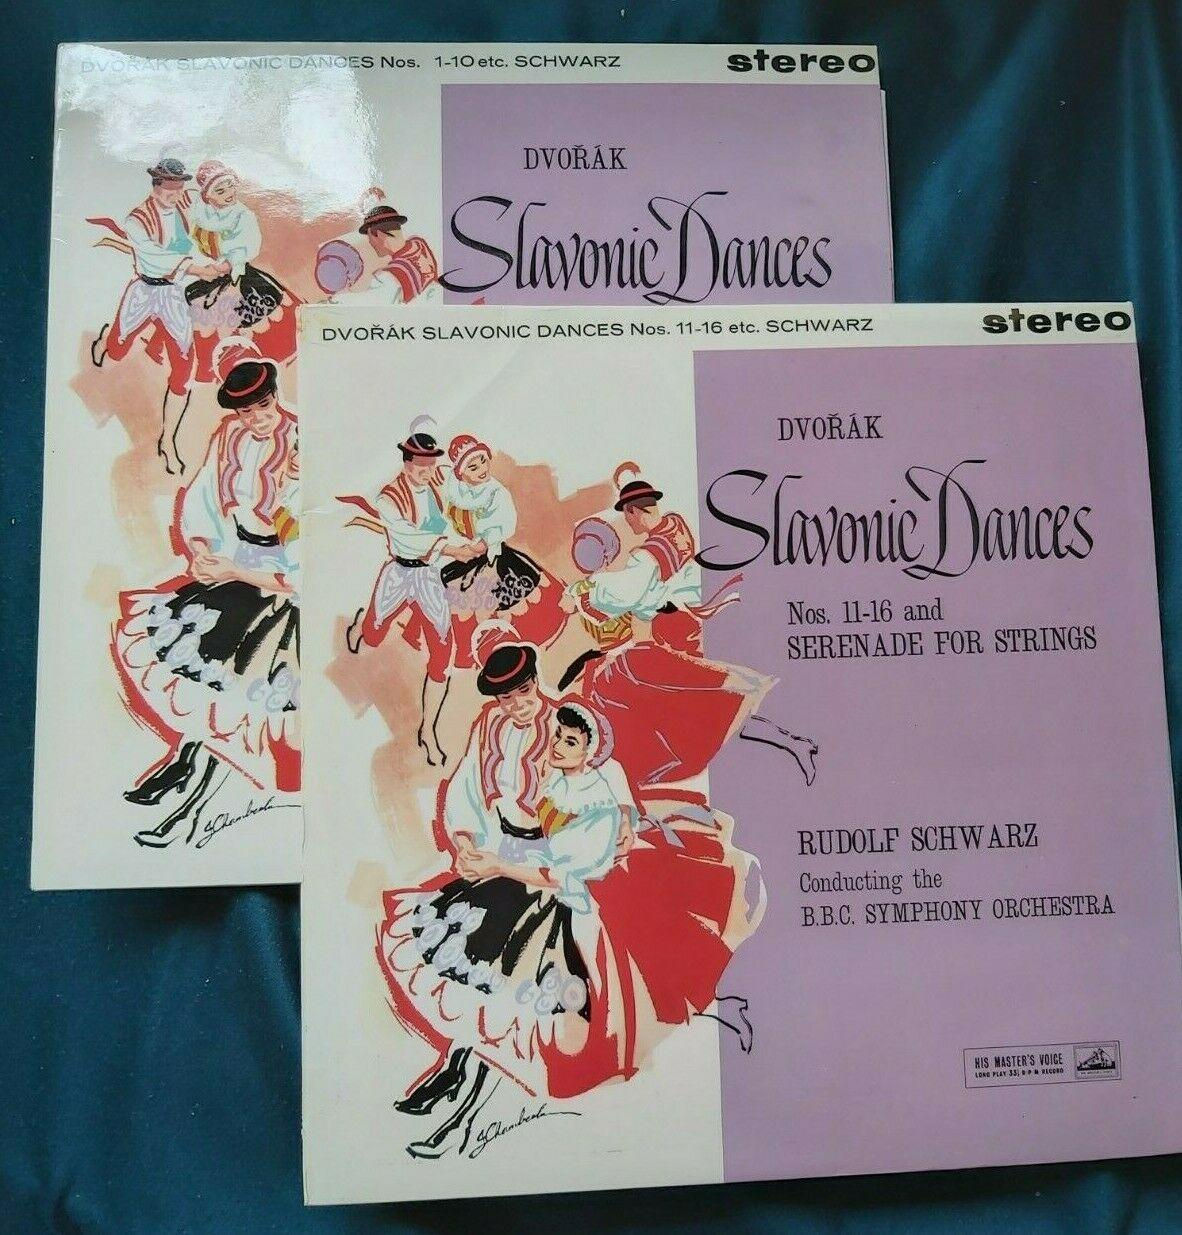 Dvorak slavonic dances Rudolph Schwarz  BBC HMV Asd 402 403 W G ed1 2 Lp NM